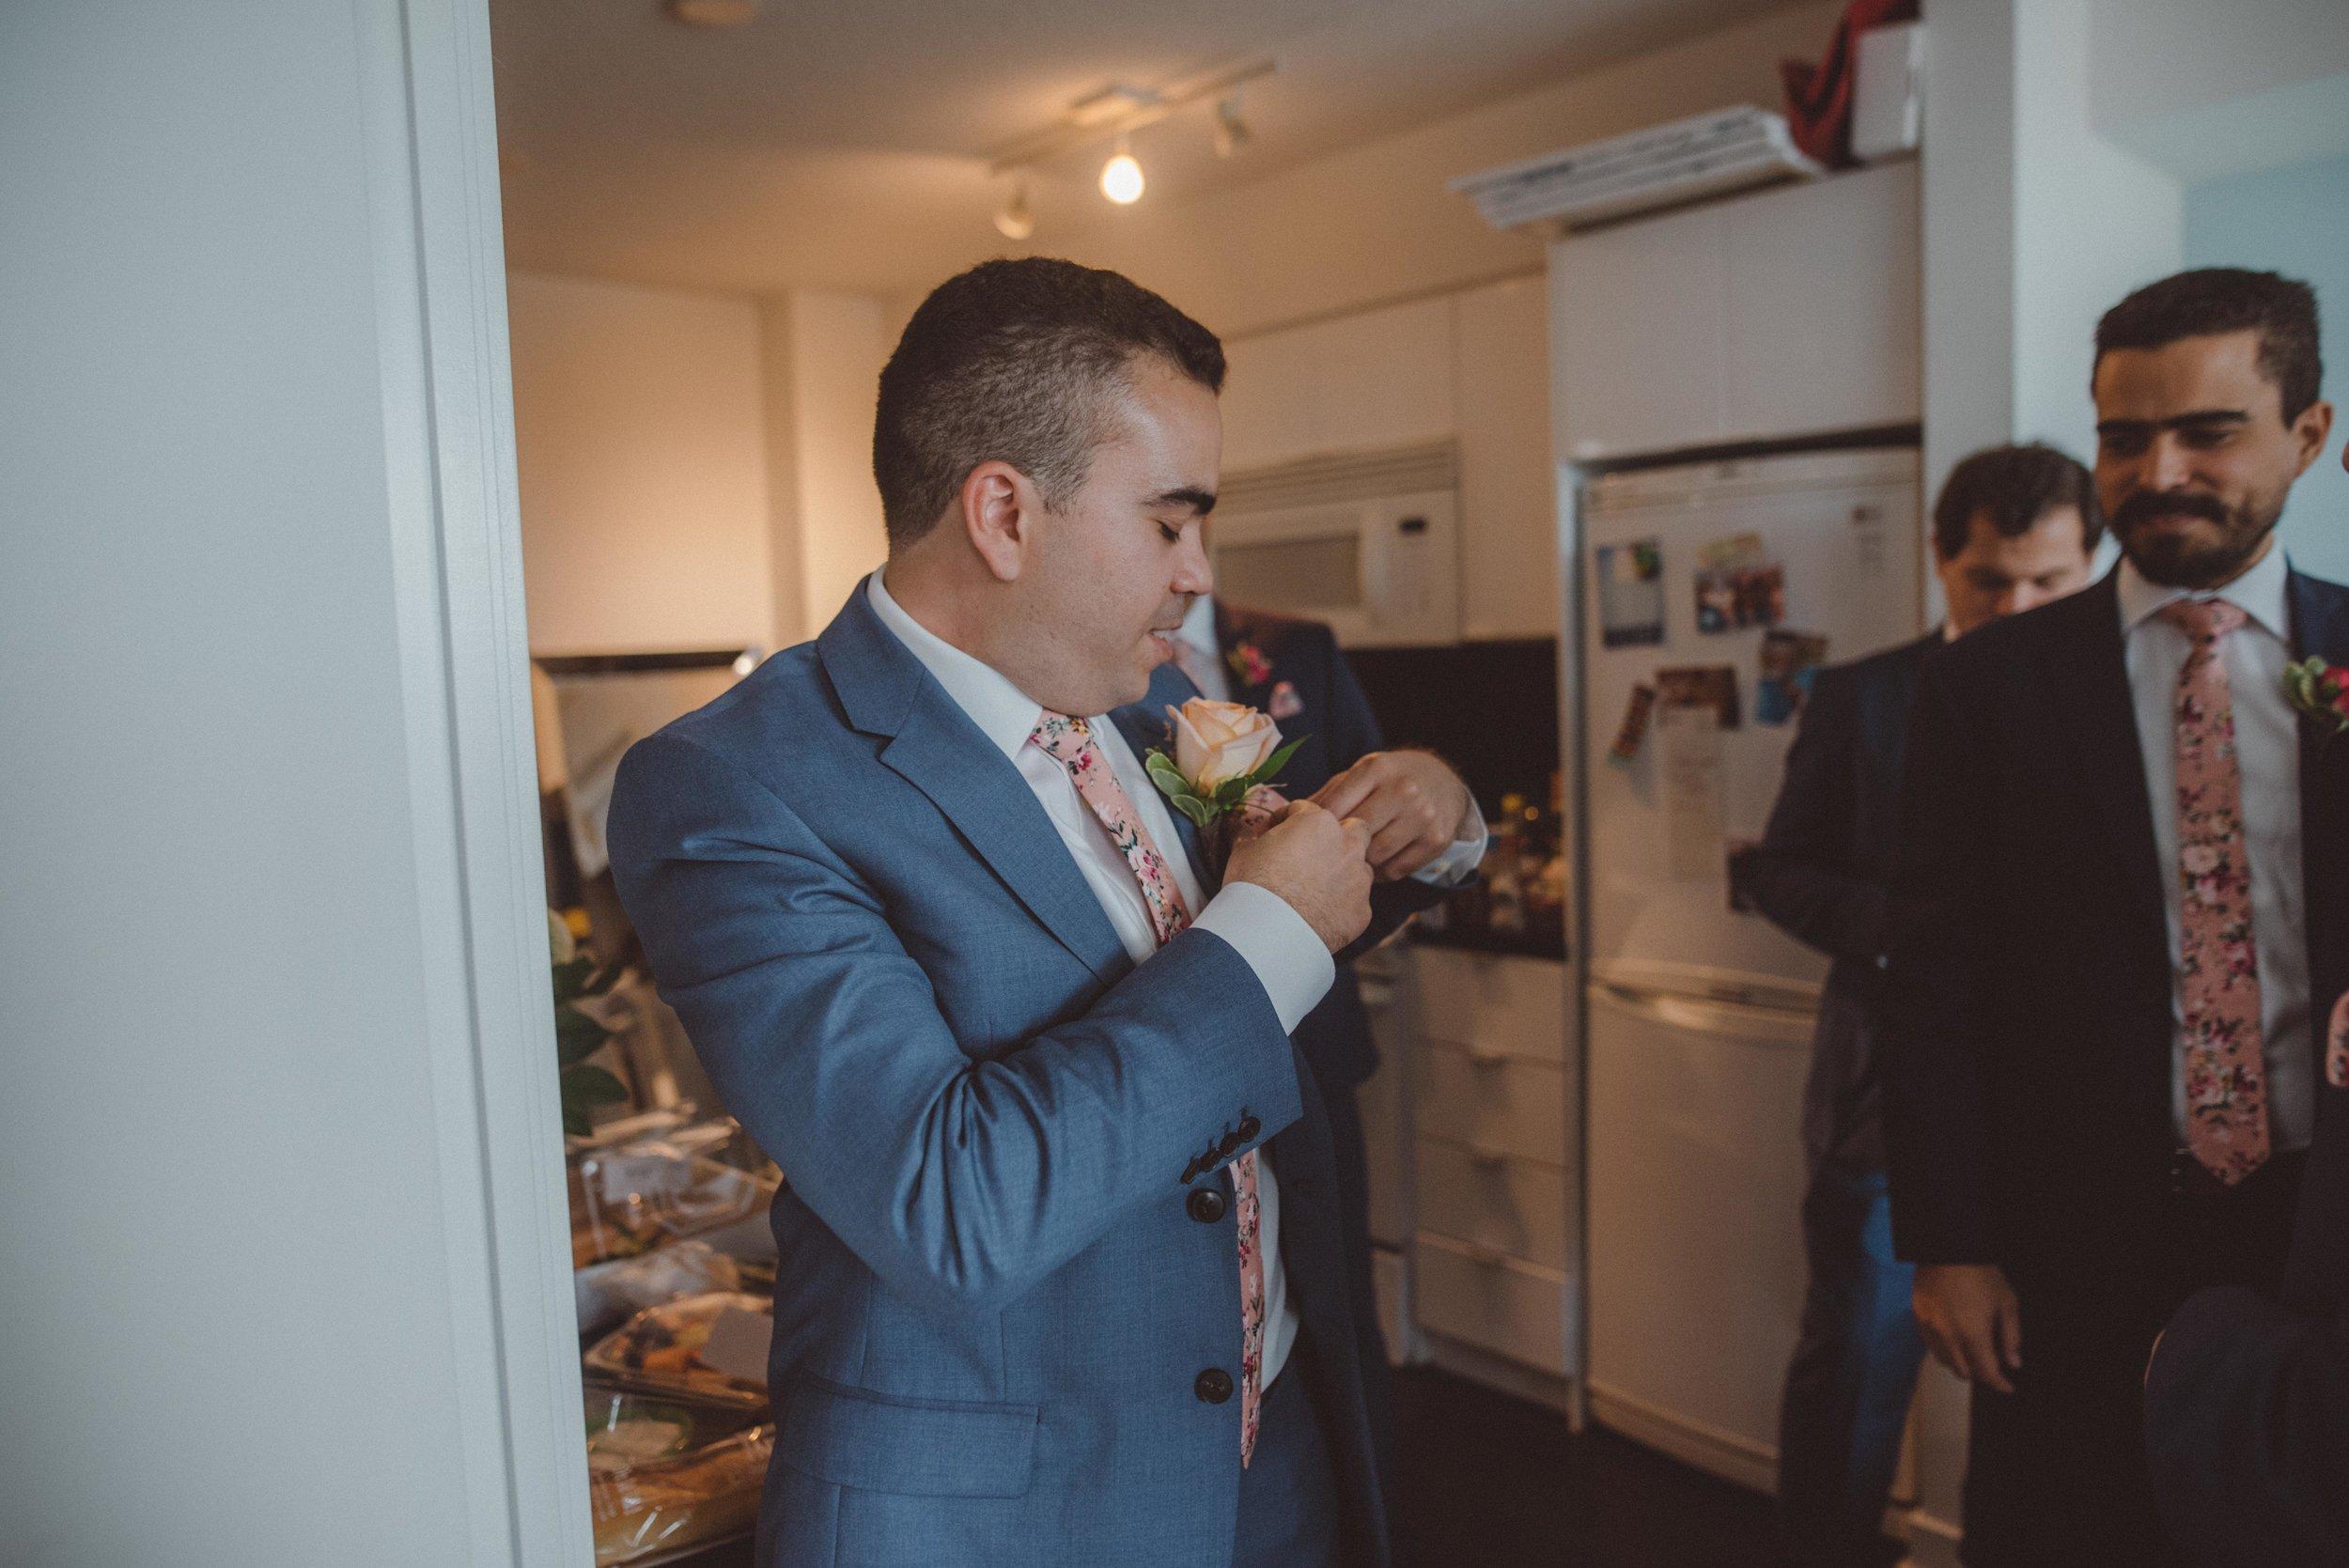 mariage_photographe_toronto_gatineau_ottawa_photographer_wedding-46.jpg